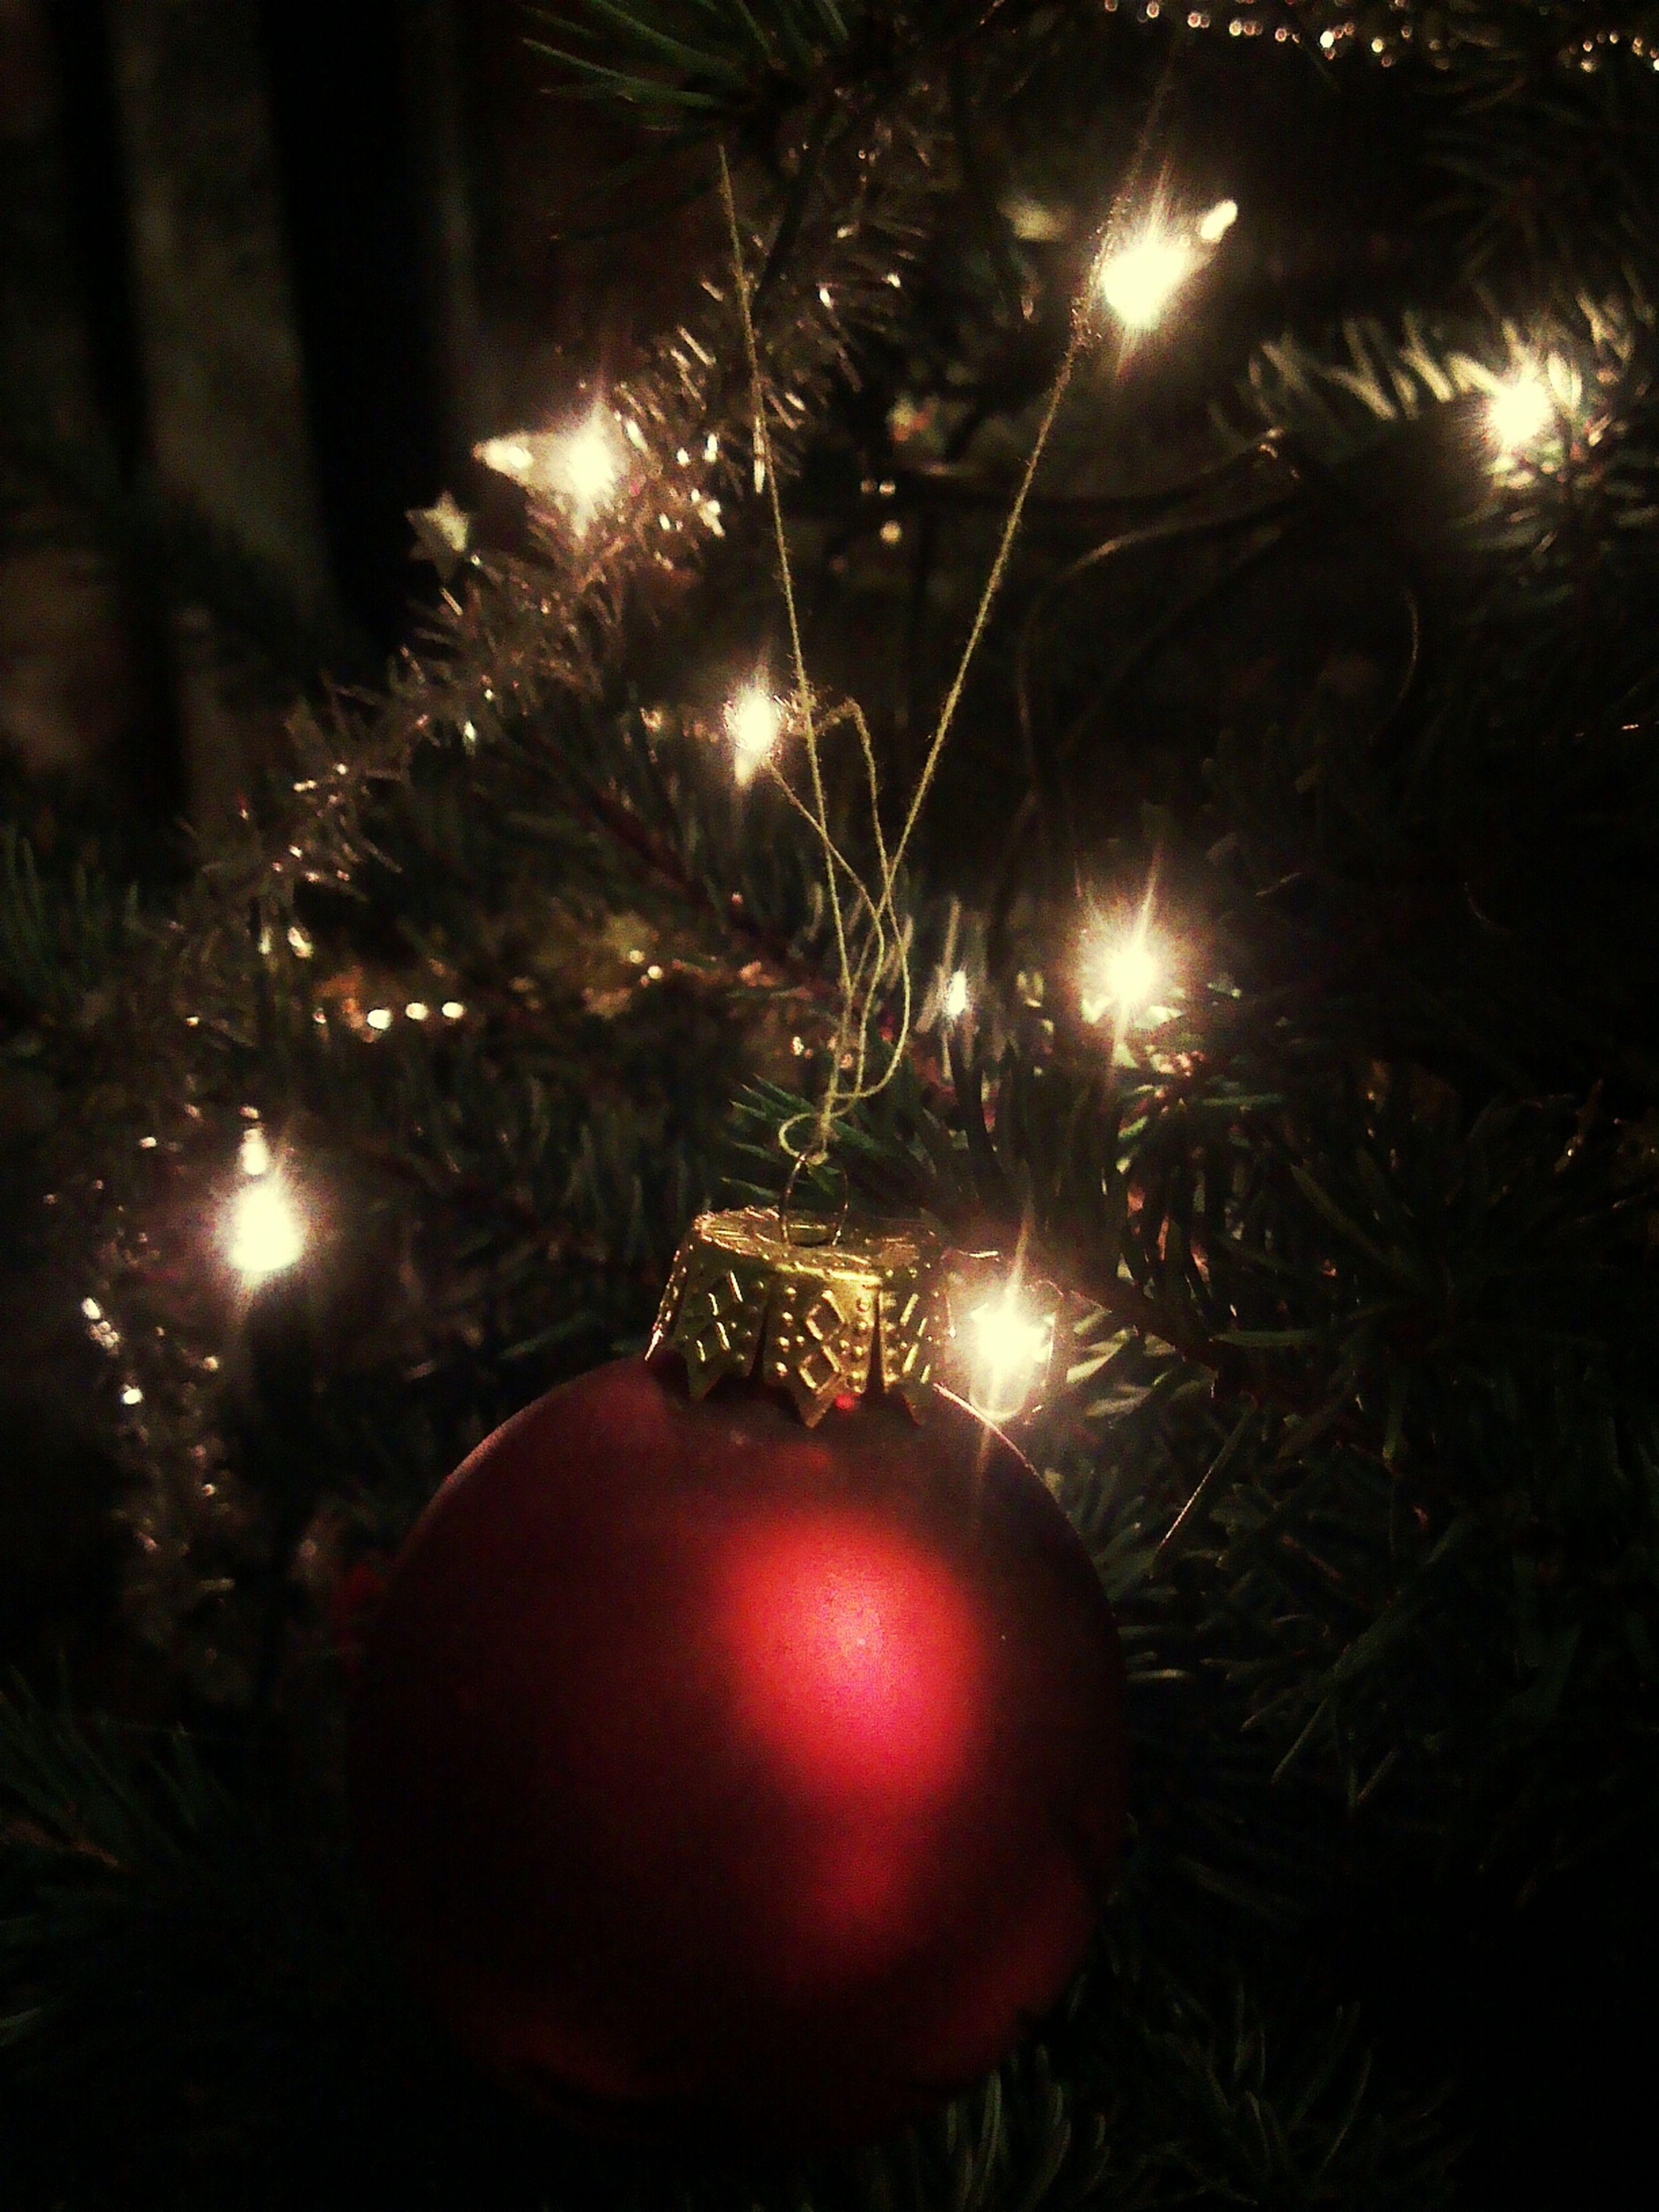 illuminated, celebration, night, christmas, christmas decoration, christmas tree, glowing, lighting equipment, firework display, christmas lights, exploding, firework - man made object, christmas ornament, decoration, celebration event, tradition, sparks, traditional festival, low angle view, holiday - event